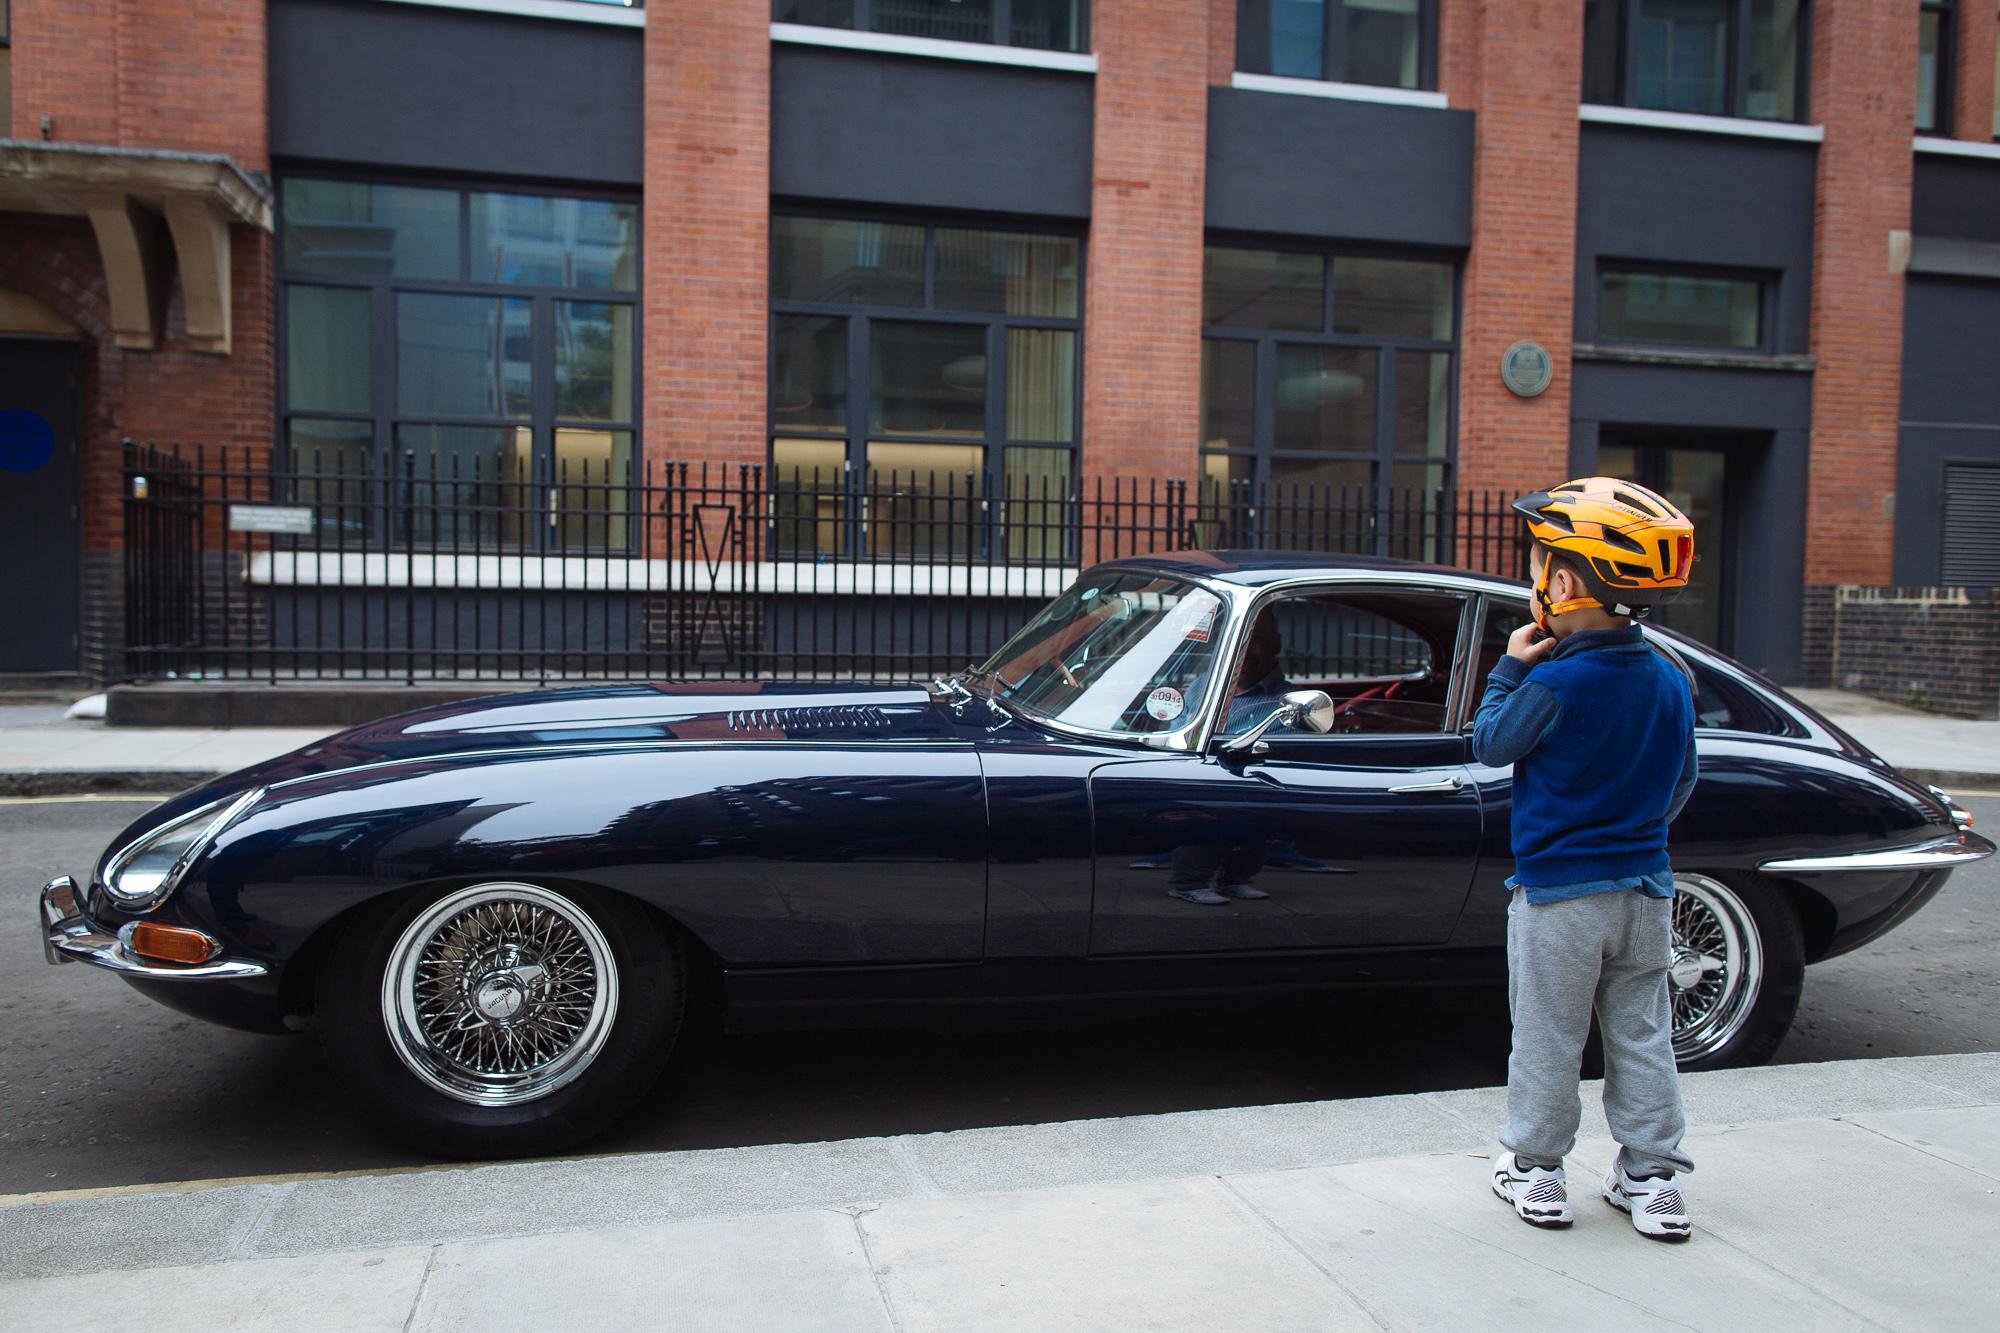 Gideon_Lang_Laddie_Gideons_Agency_Roadshow_London_Events_Photographer-18.jpg